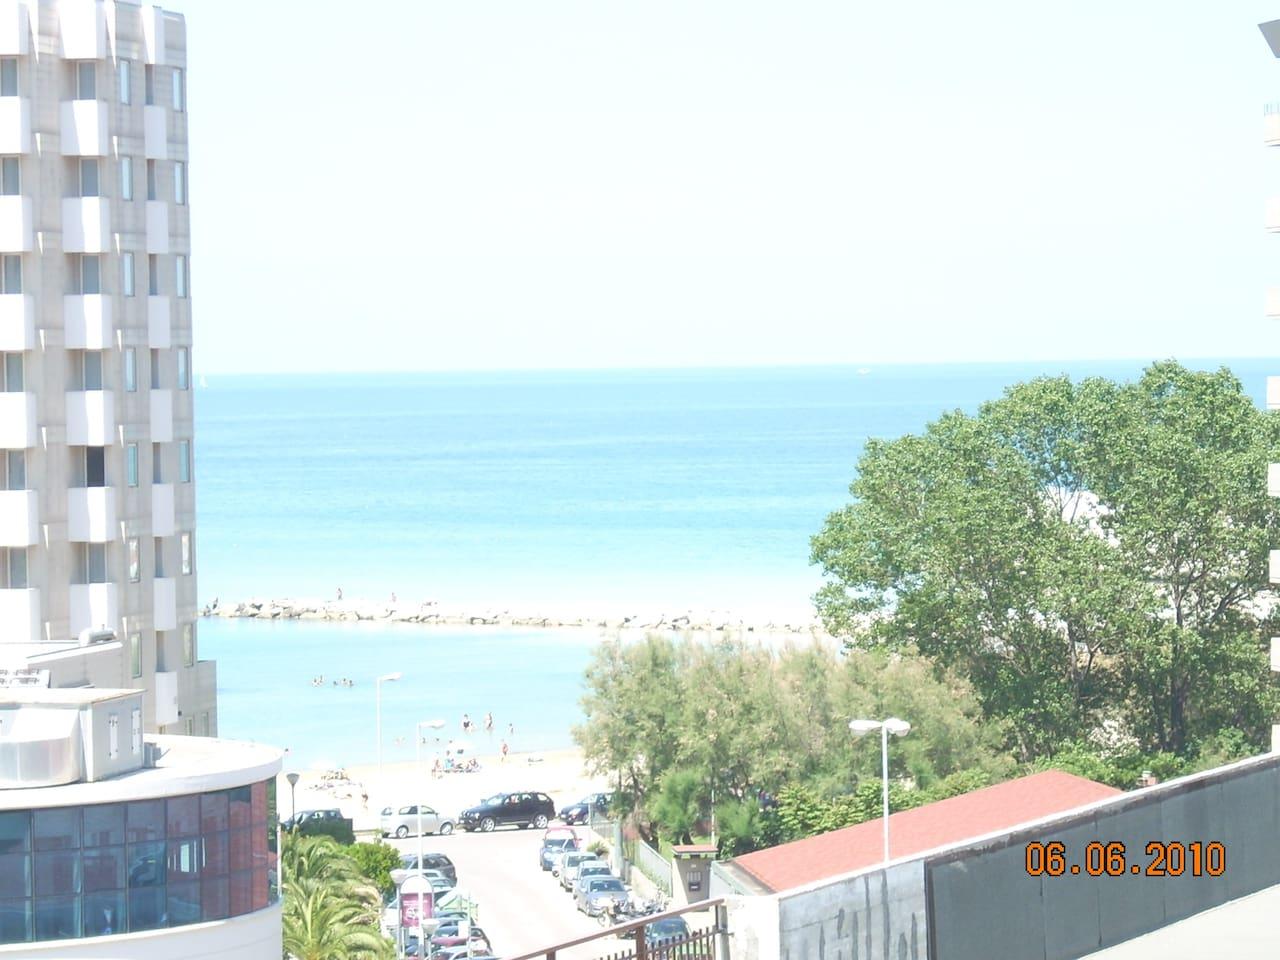 Gabbiano apt: Enjoy sea view and sandy beach